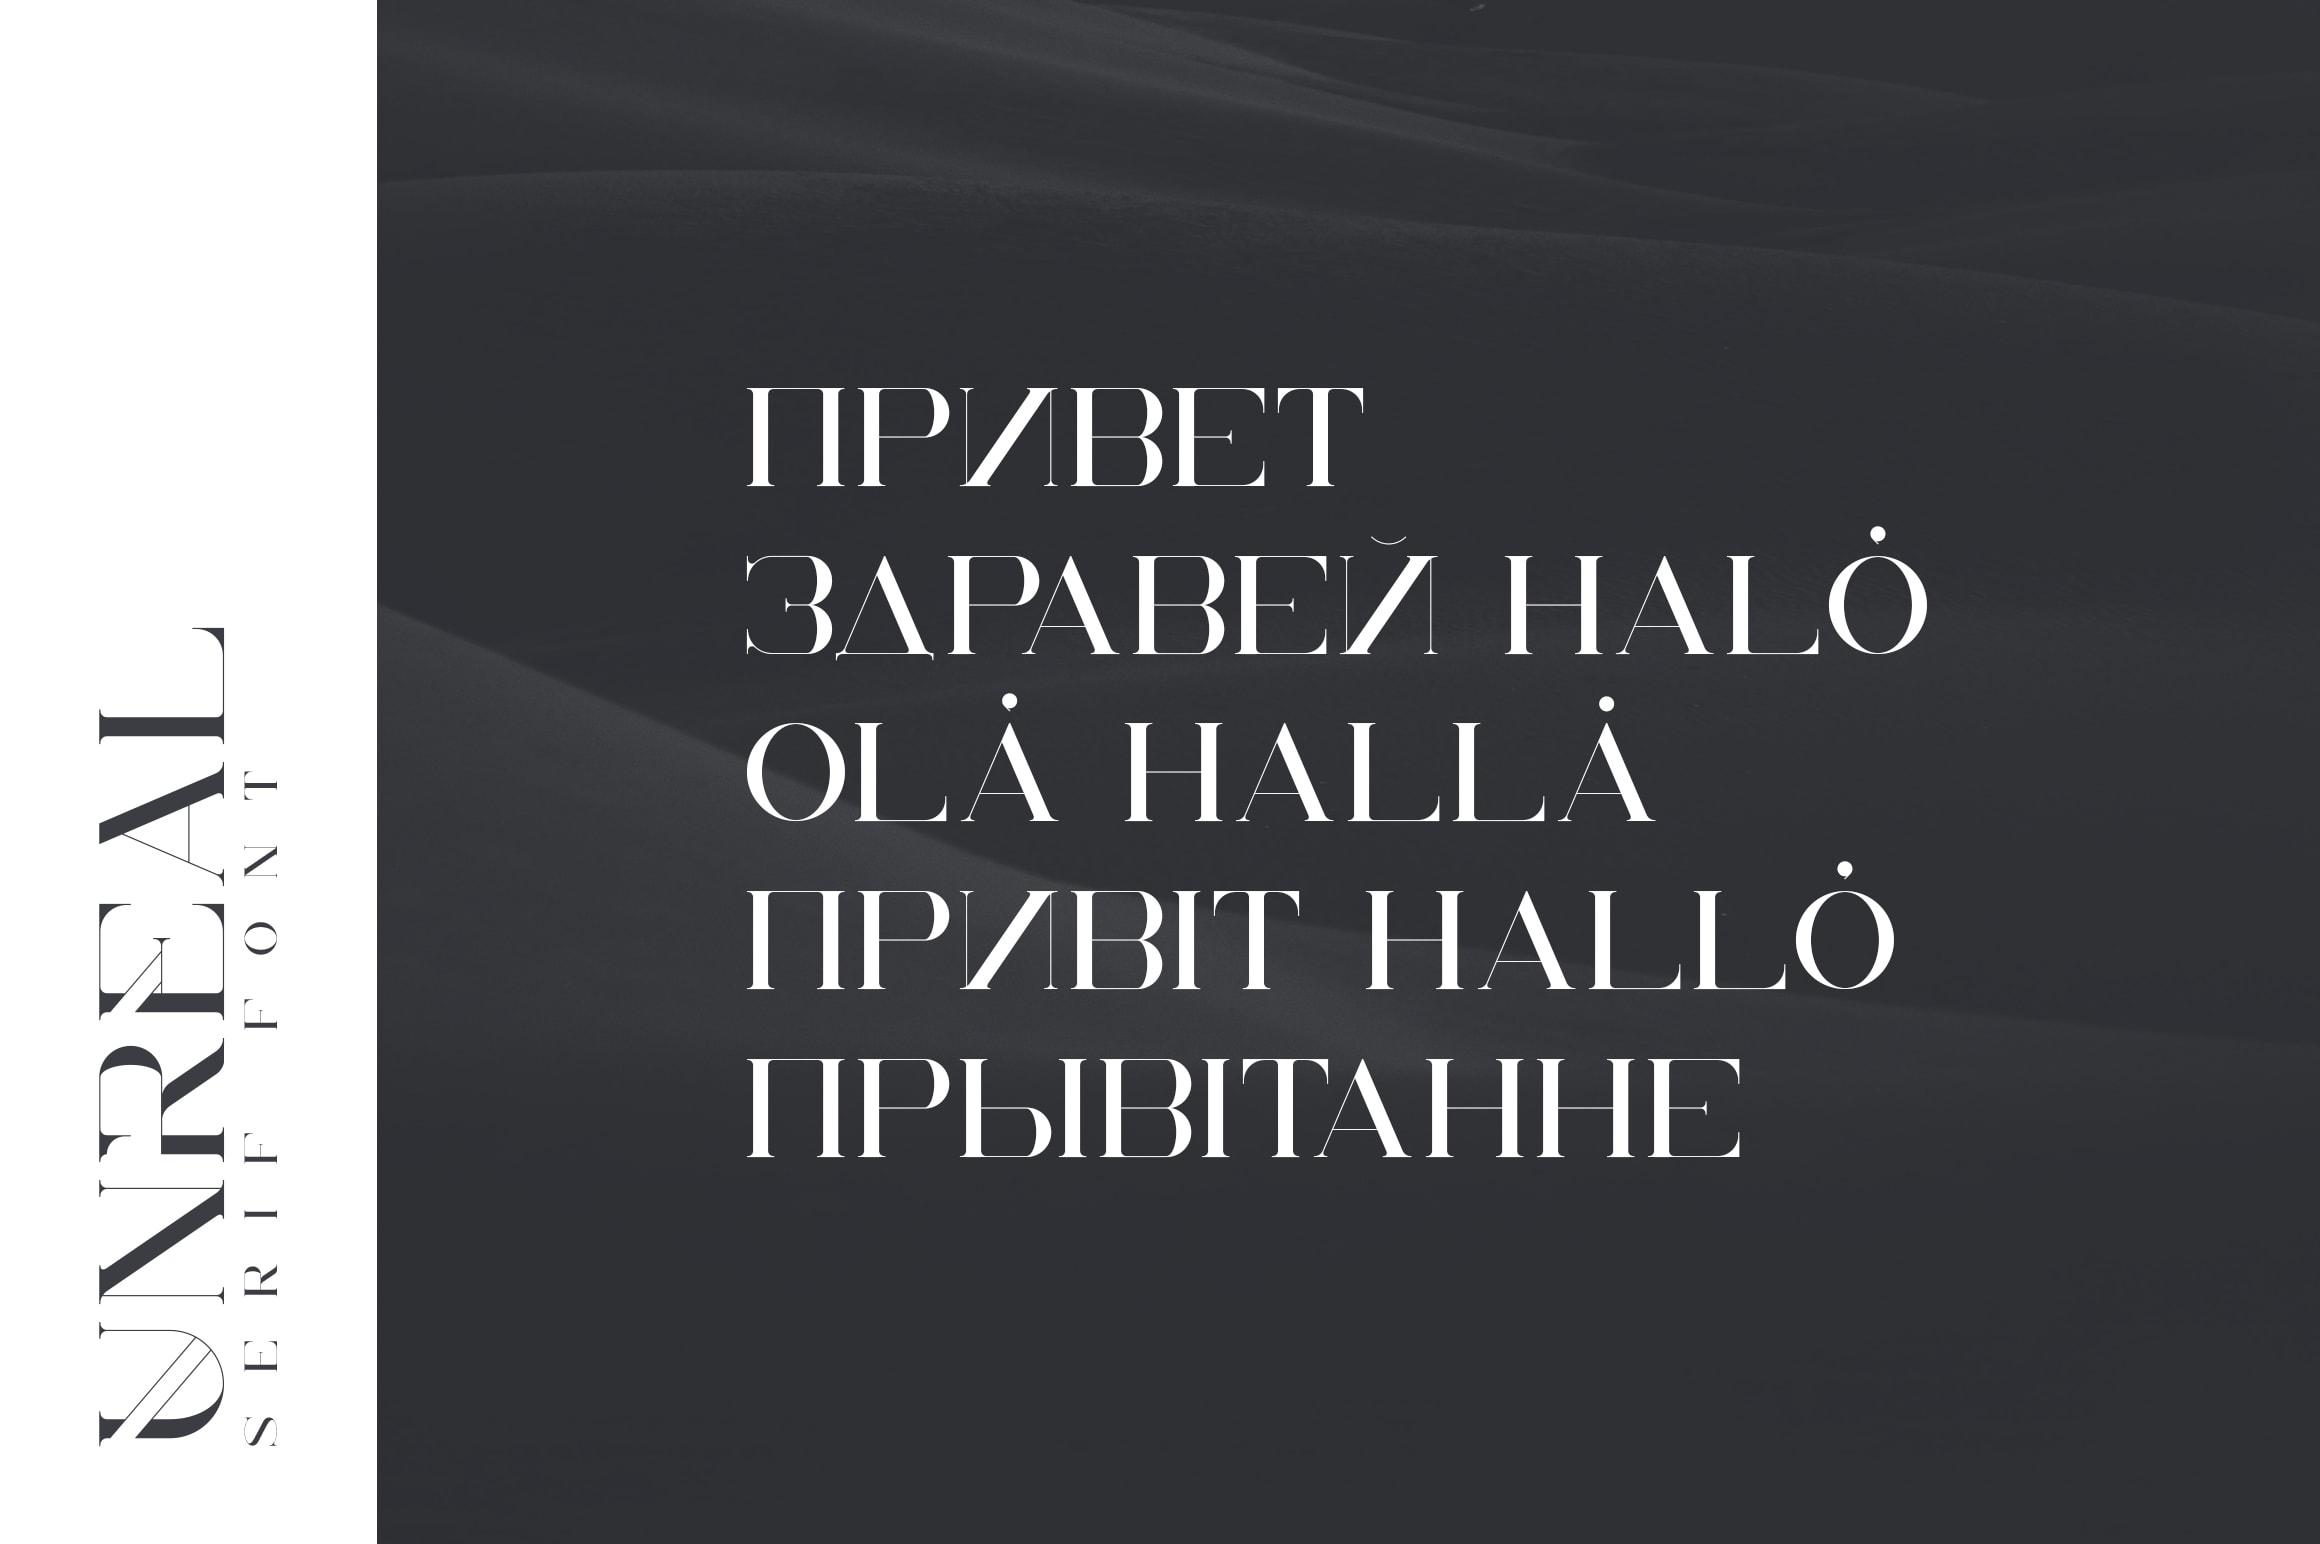 Unreal Serif Font: Latin & Cyrillic - 2 min